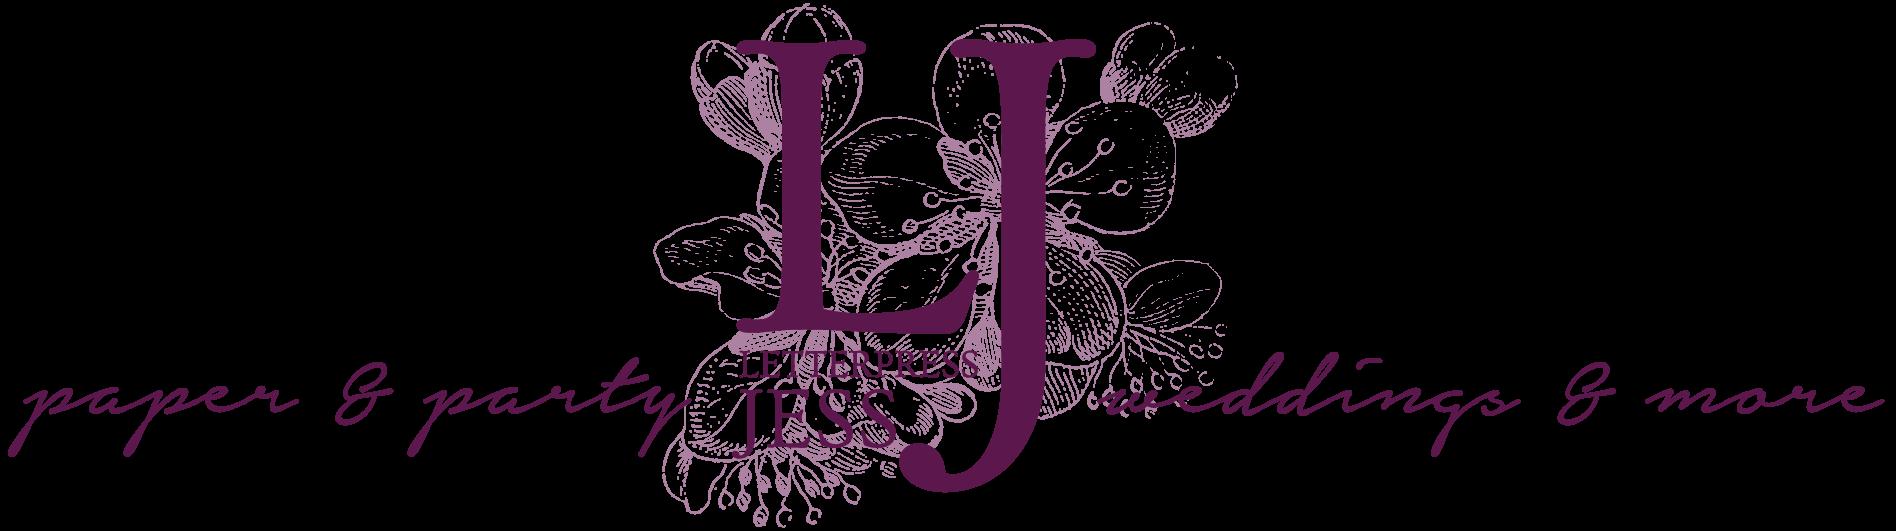 Letterpress Jess